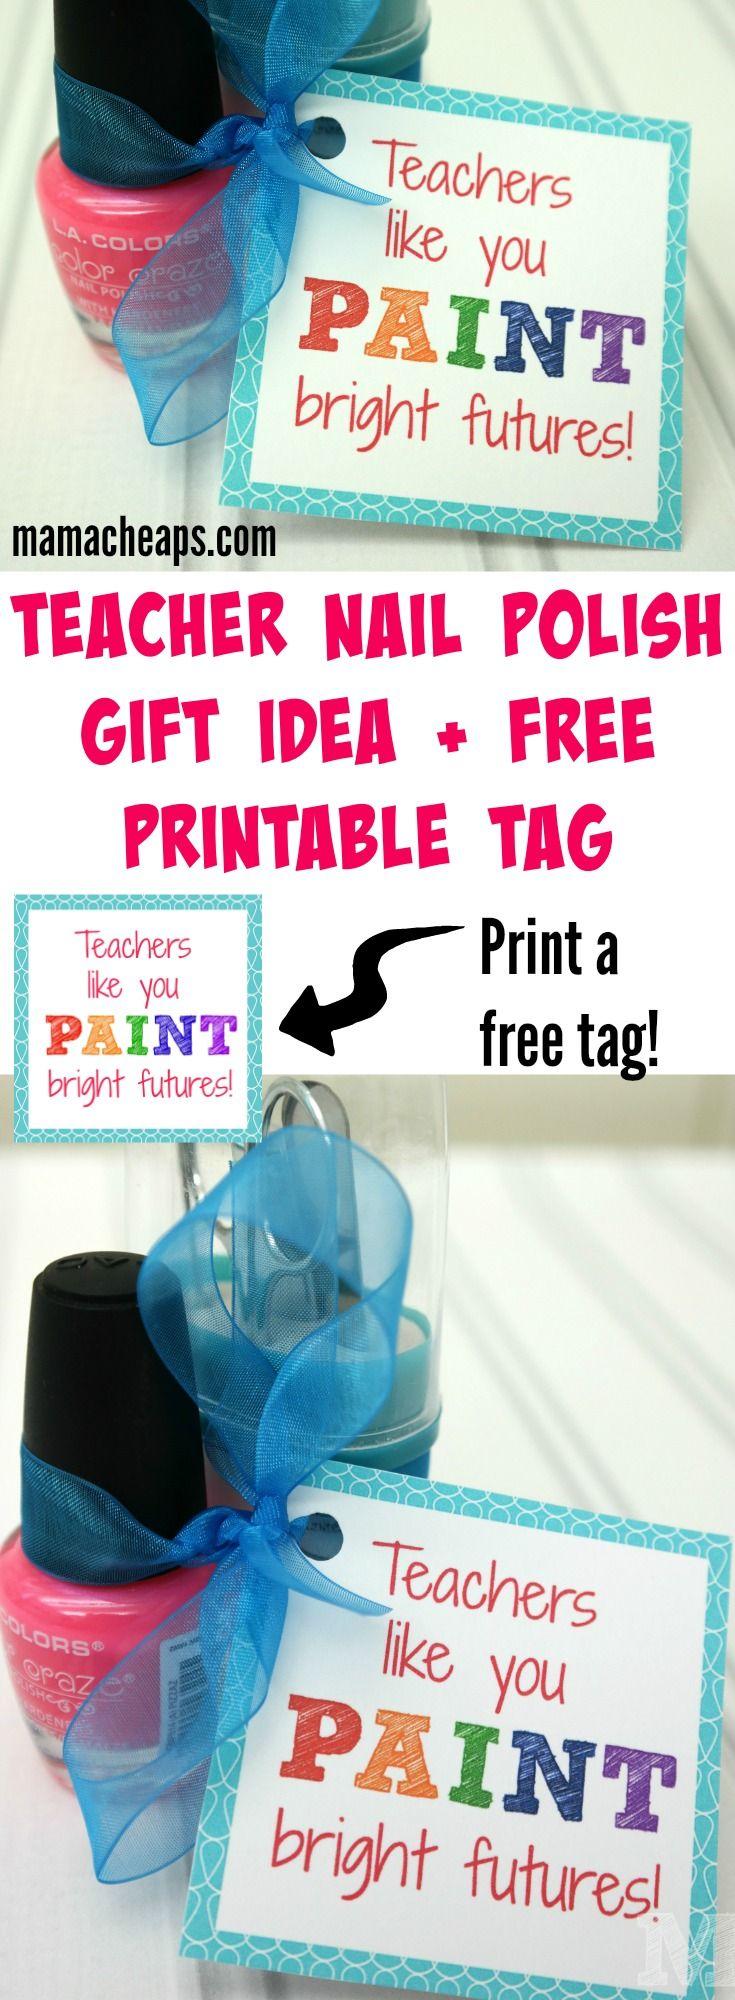 Teacher Nail Polish Gift Idea + FREE Printable Tag | Mama Cheaps® -   17 diy projects For School nail polish ideas